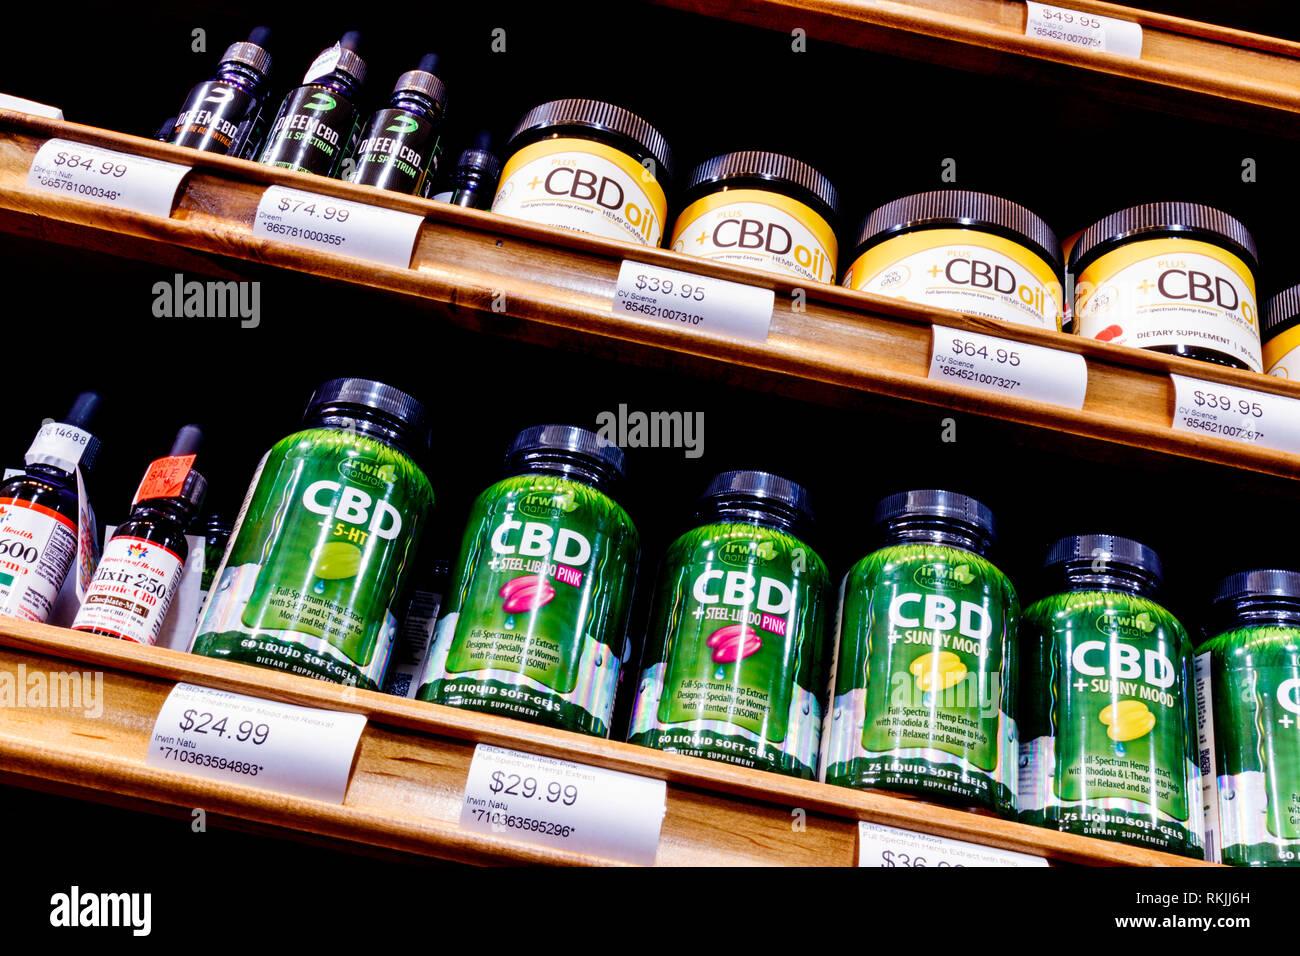 Cbd Oil Stock Photos Images